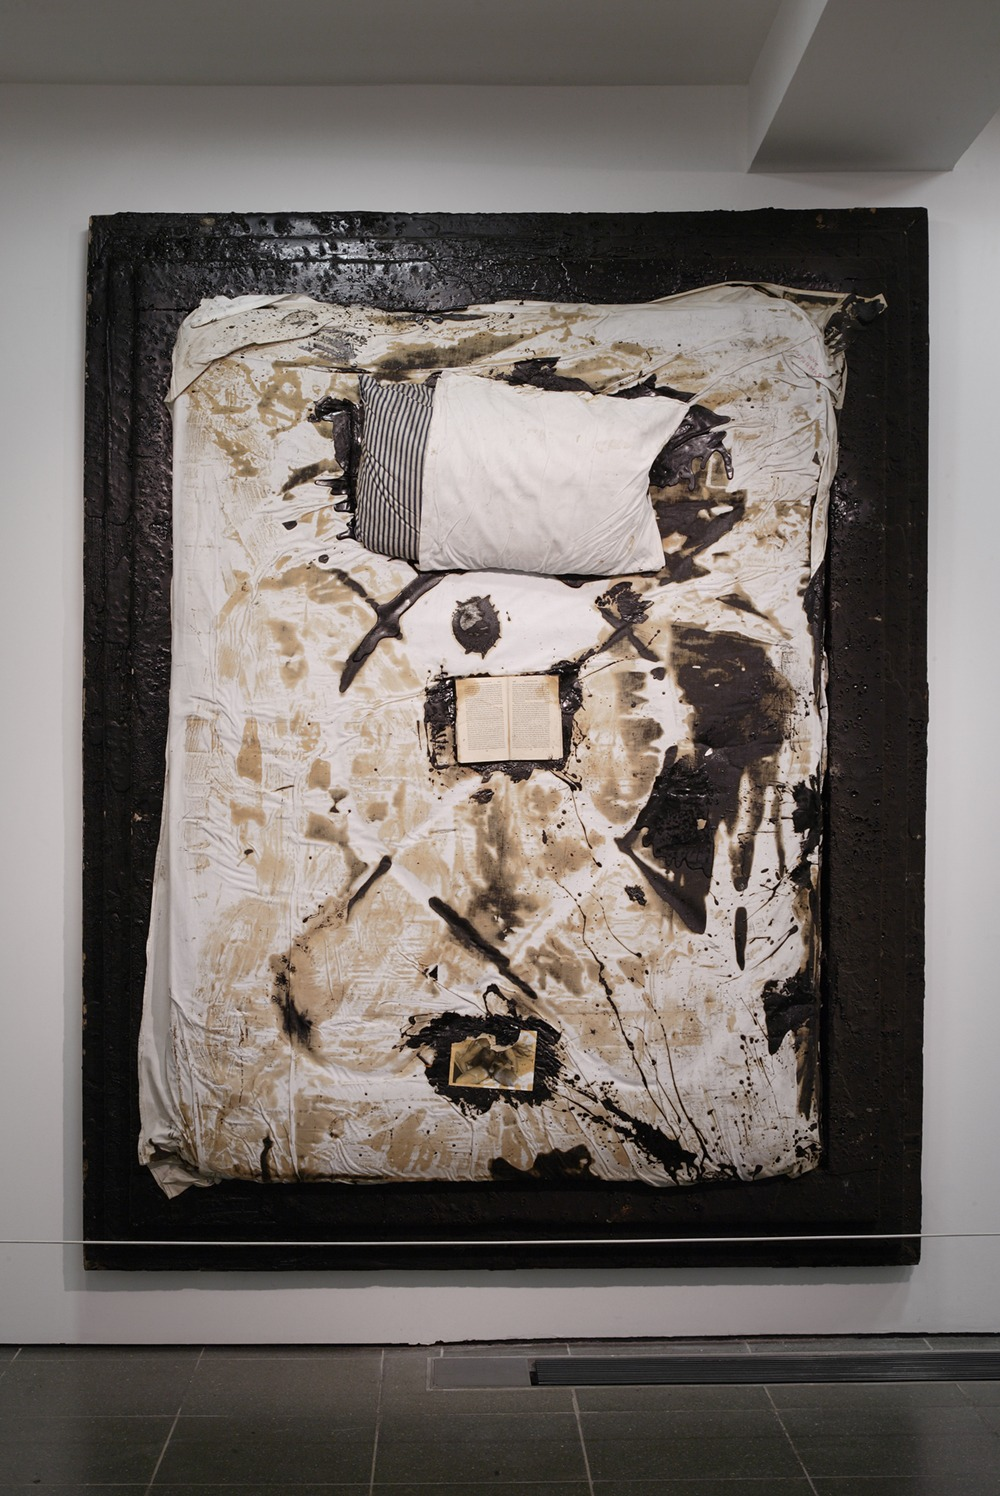 Derek Jarman, Bed (IV), 1988-89, installation photograph from Brutal Beauty at Serpentine Galleries, 2008, photo: Sylvain Deleu